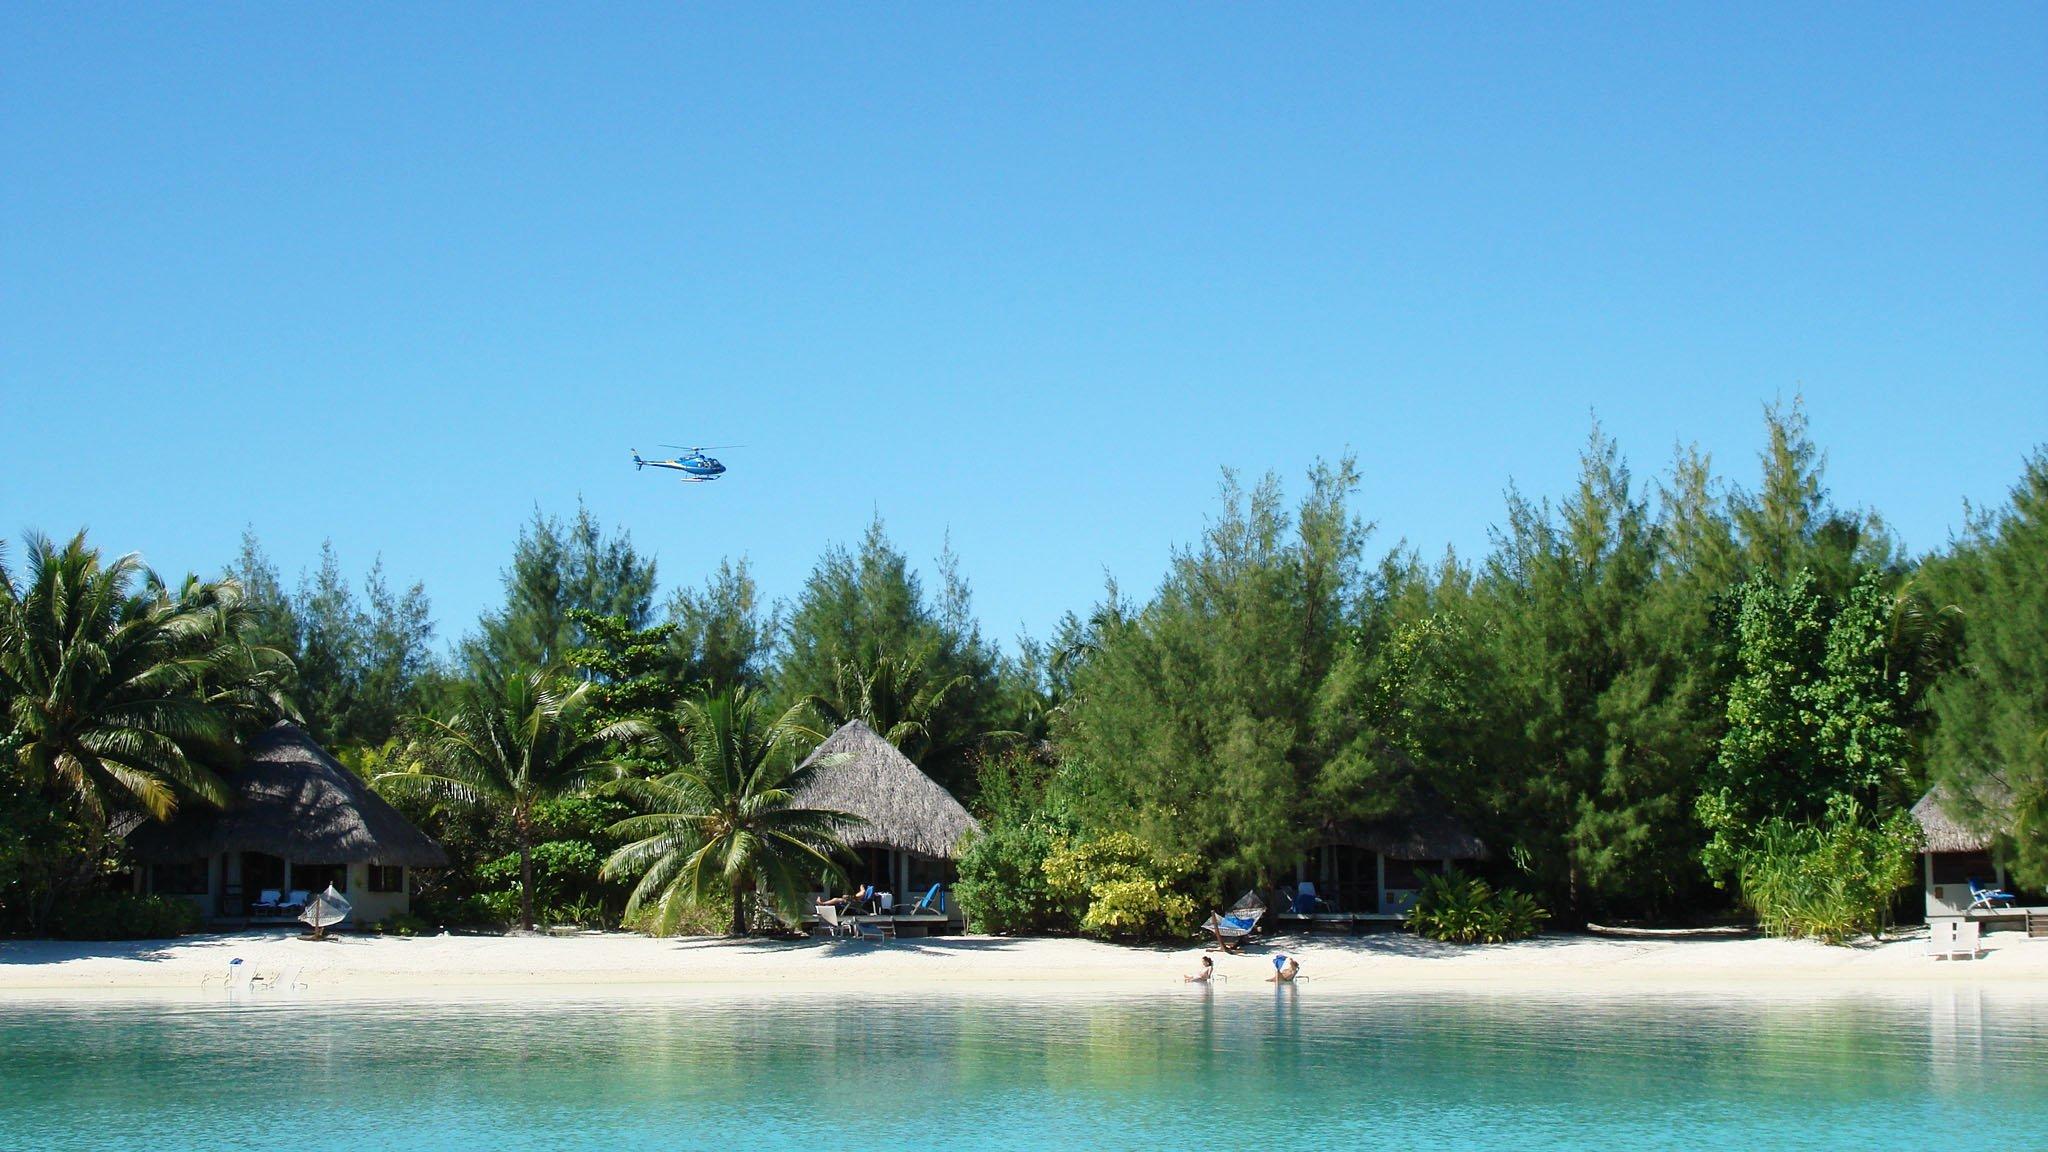 Vista de Bora Bora desde helicóptero